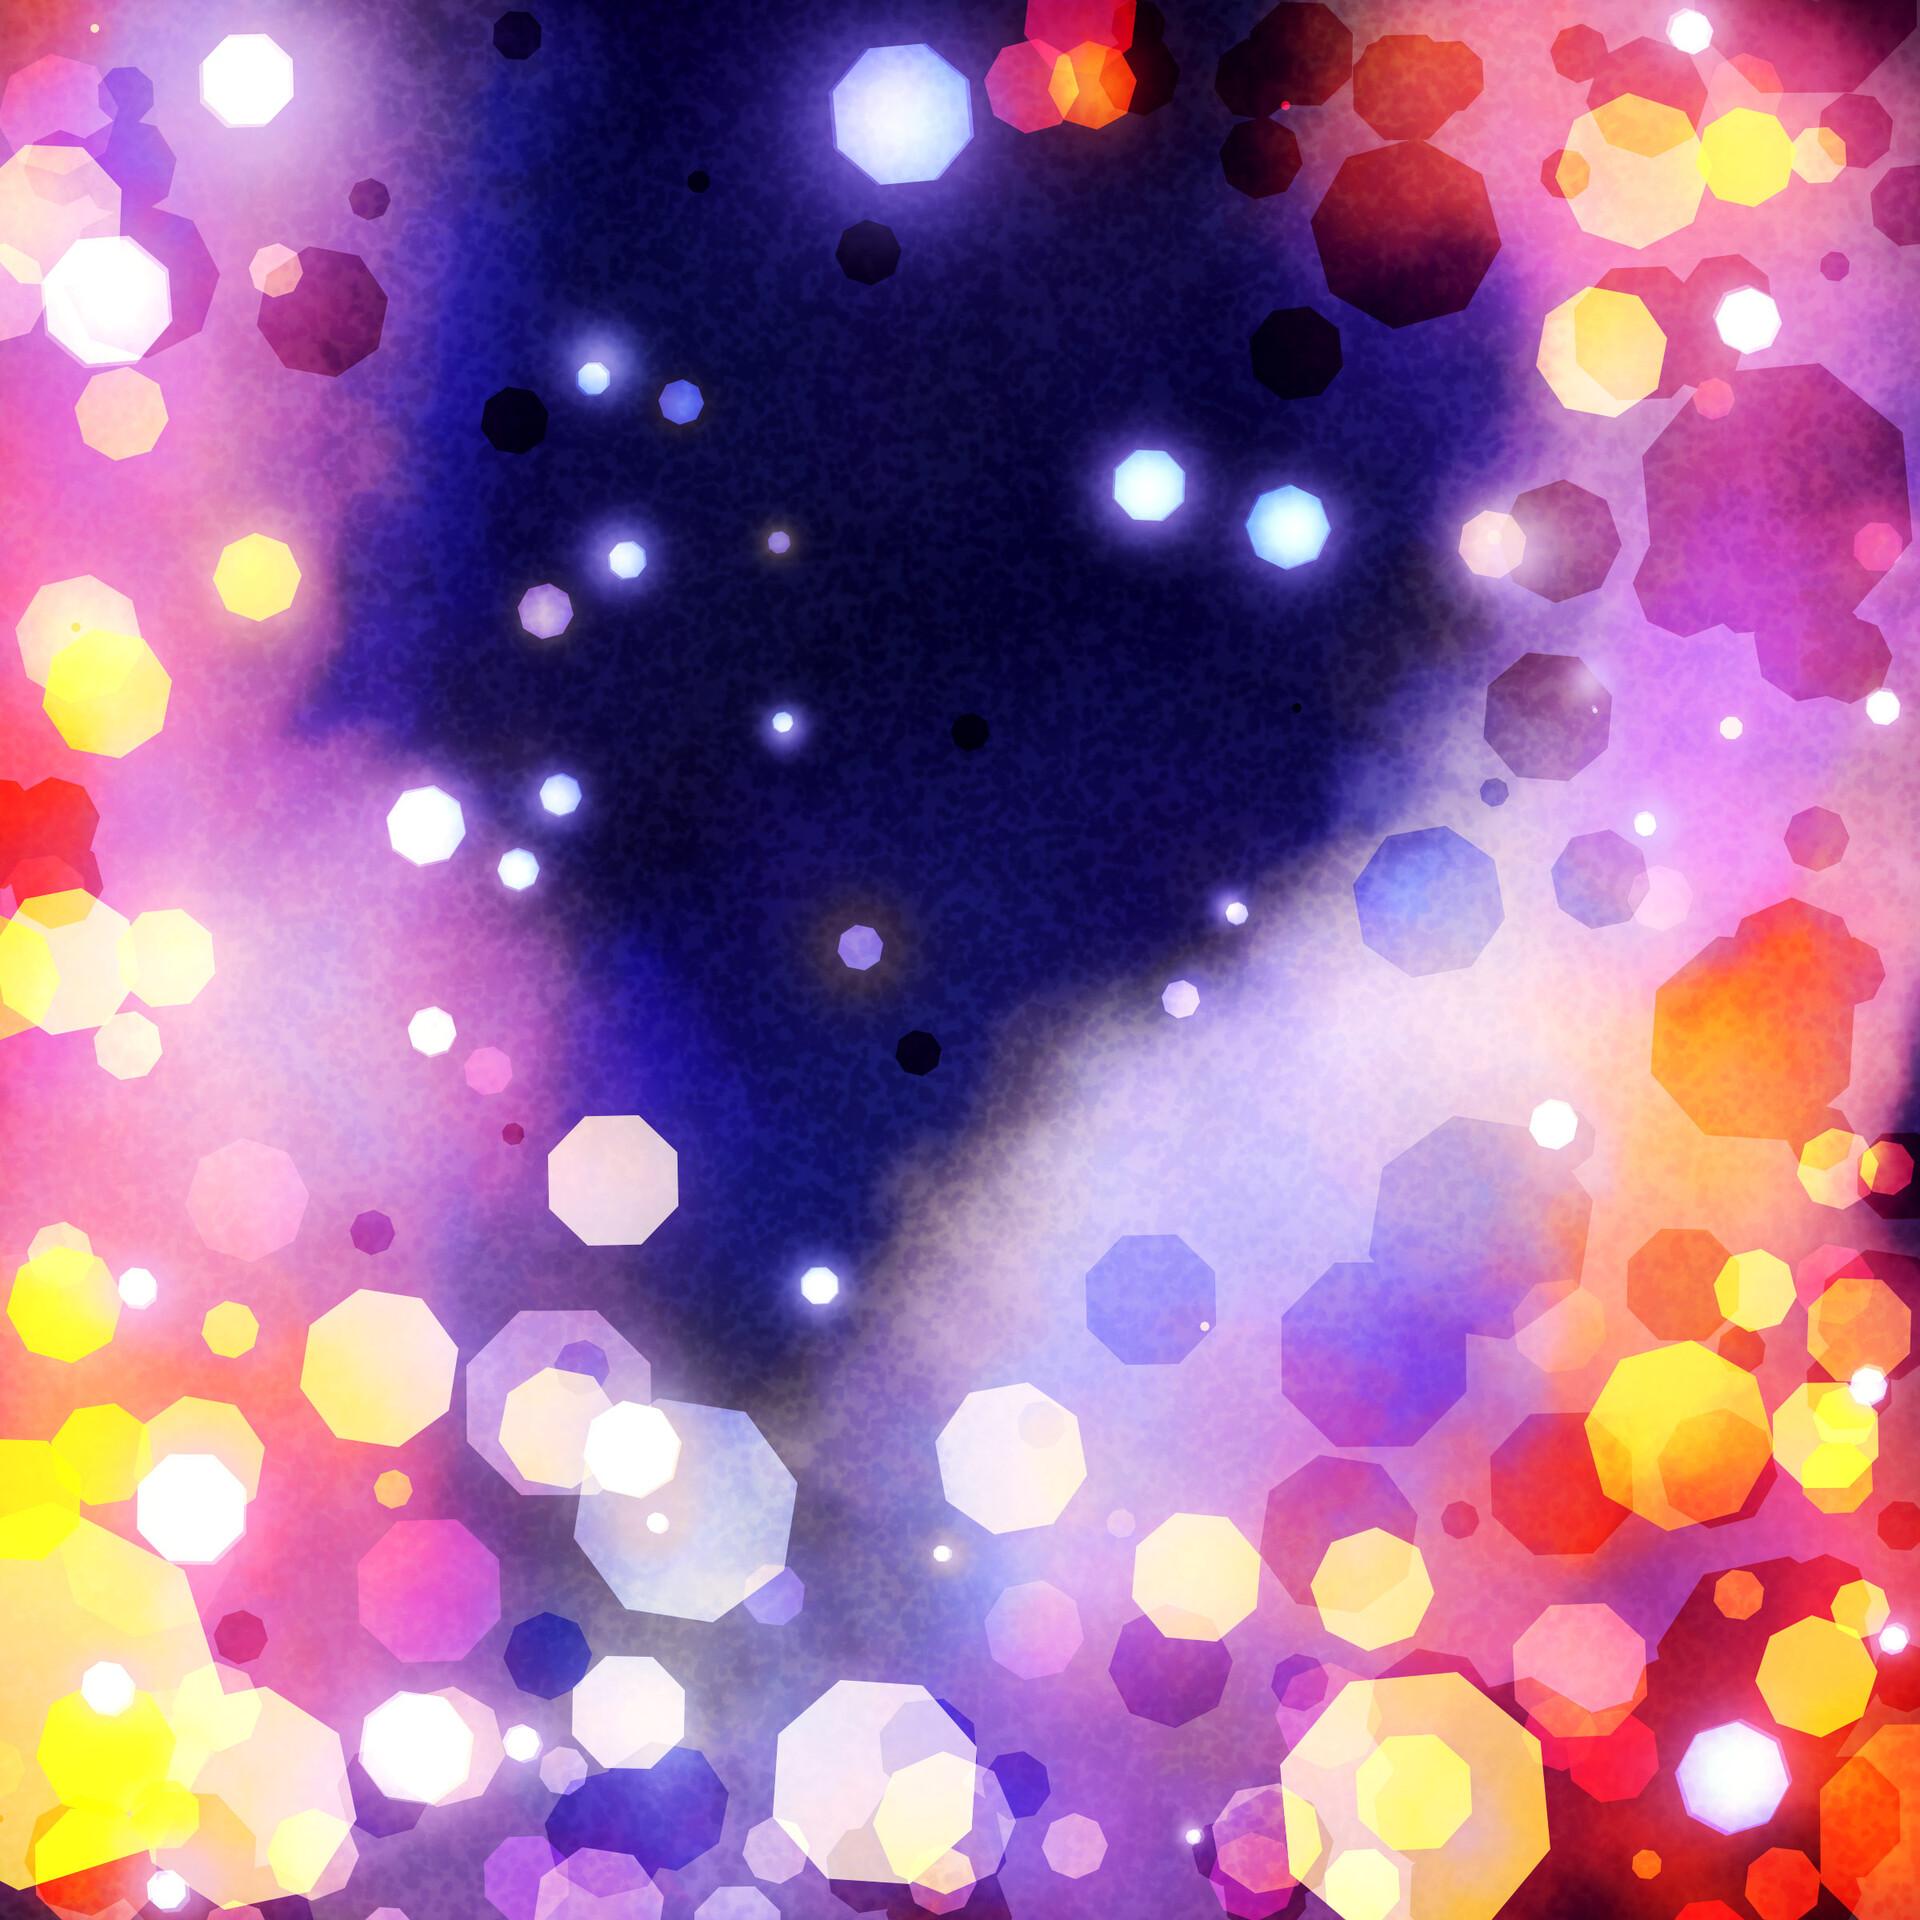 Brienne broyles pl star study 31